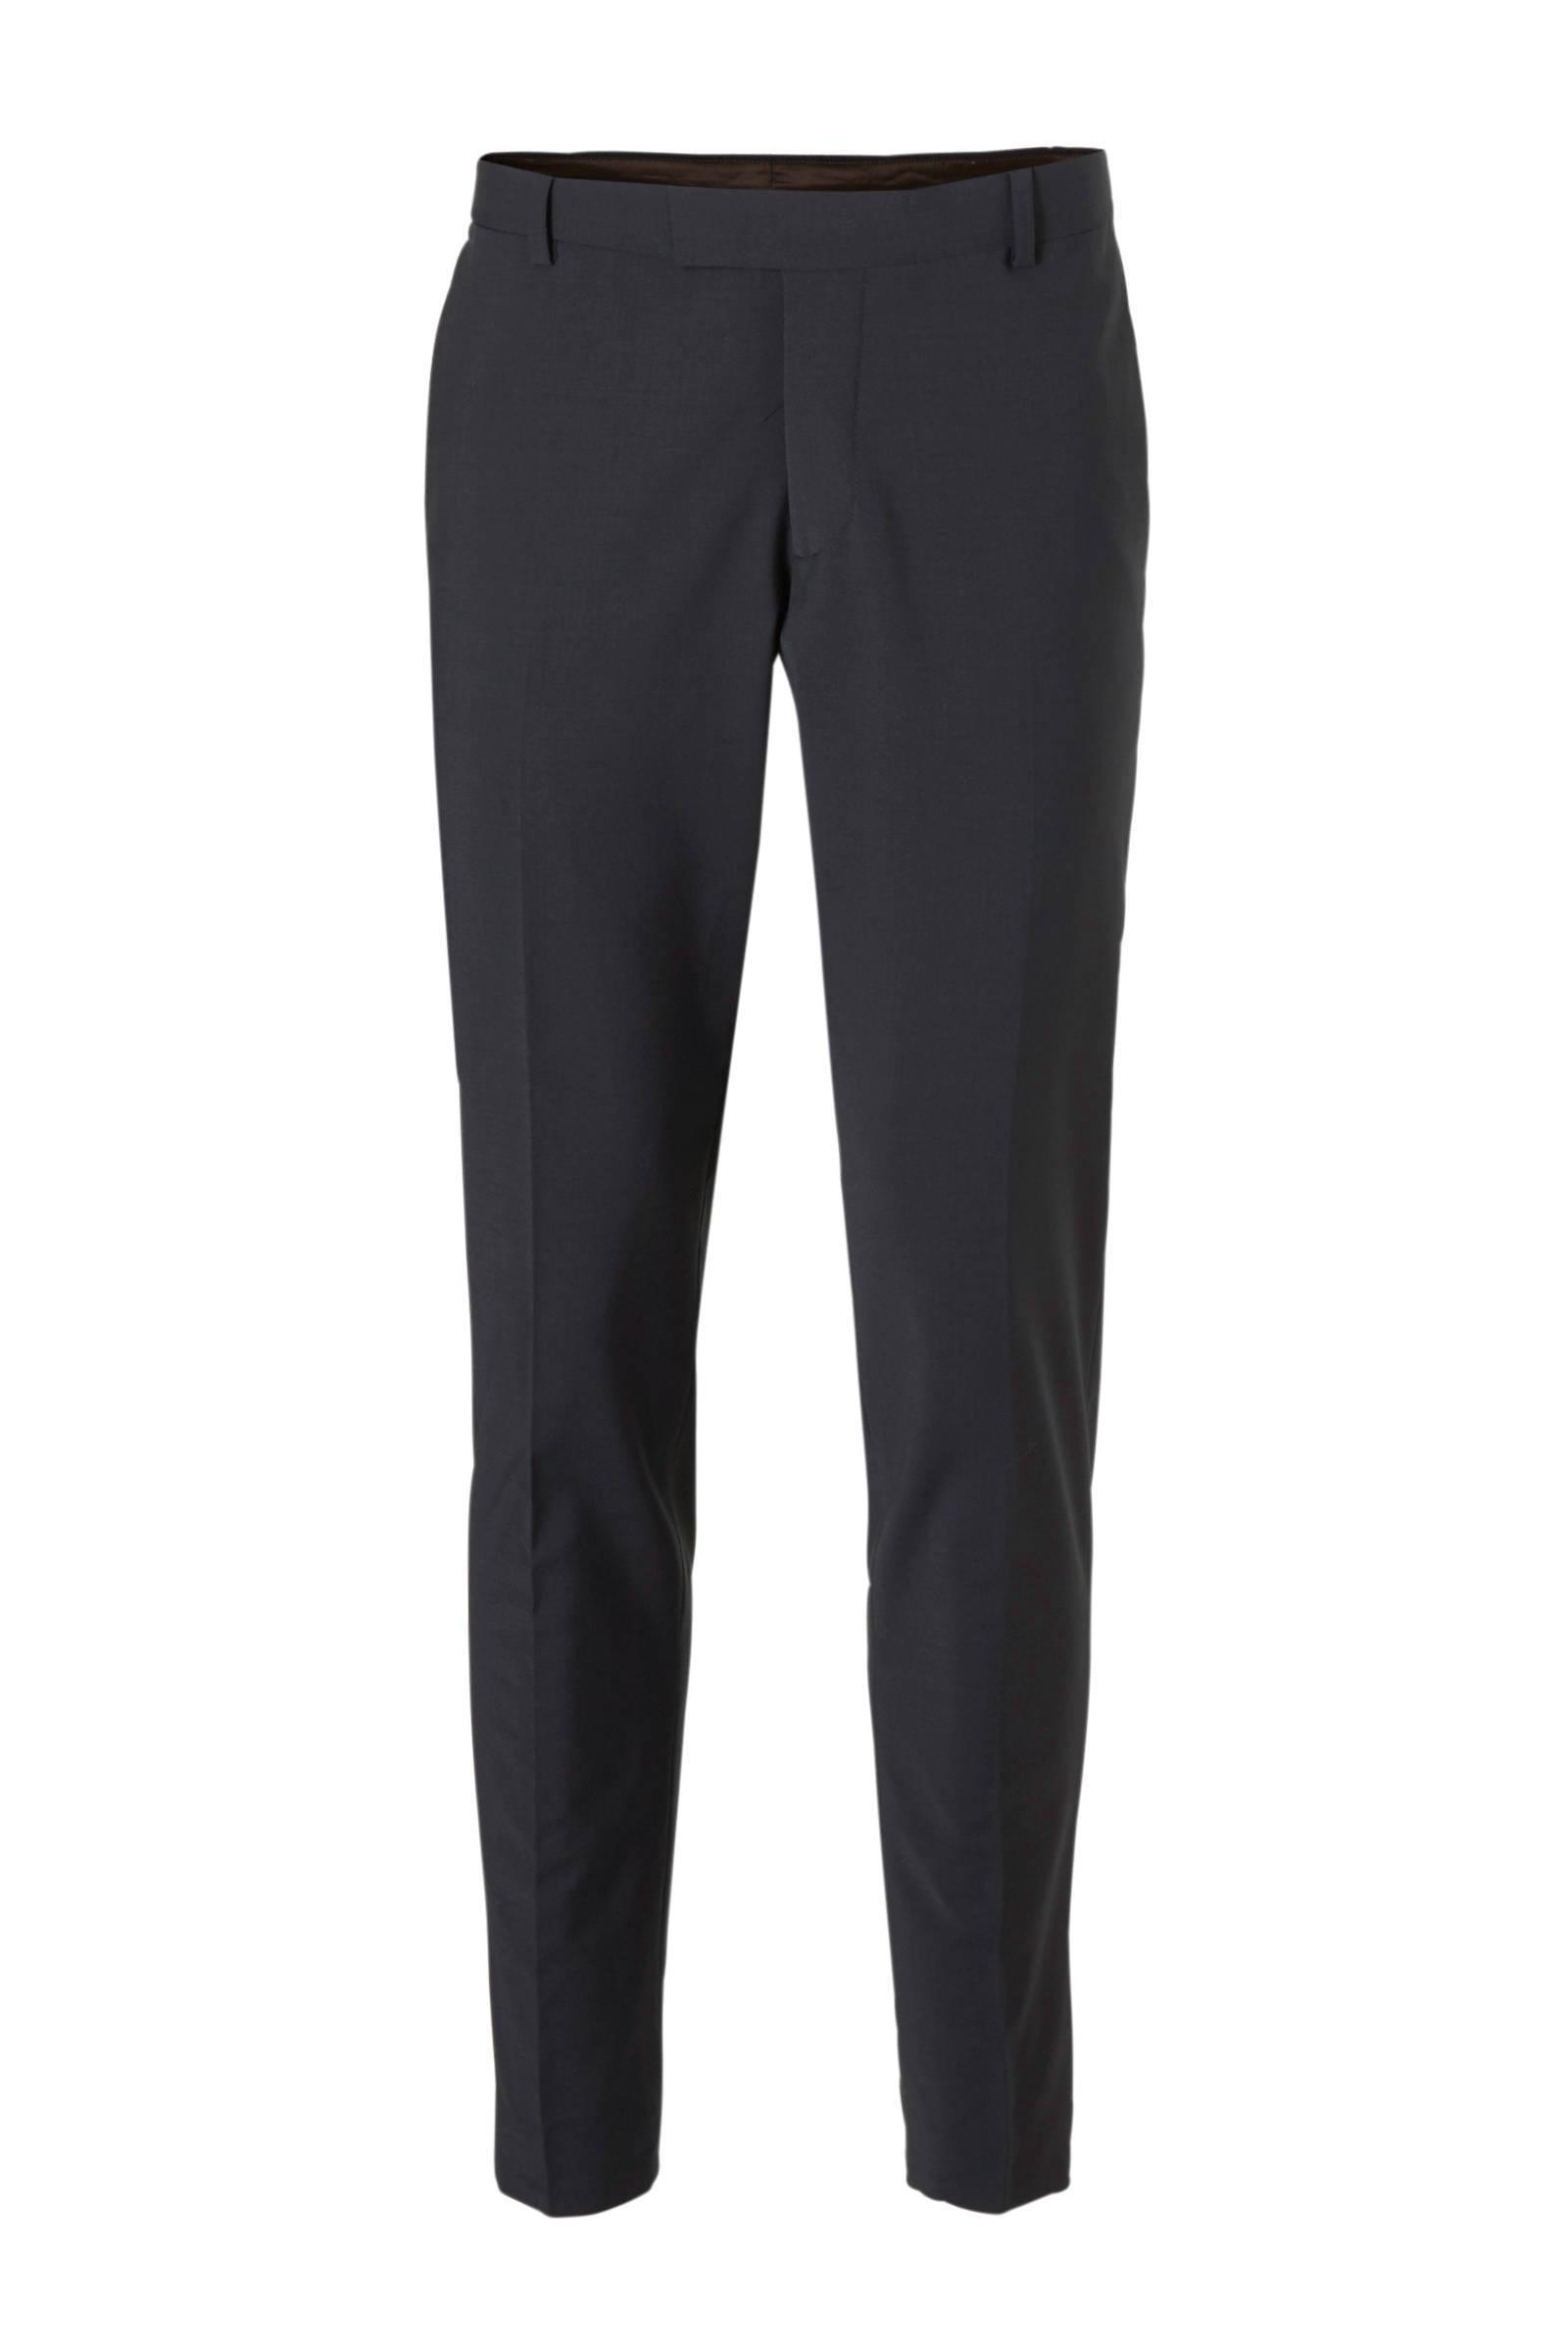 ESPRIT Men Collection slim fit pantalon marine | wehkamp